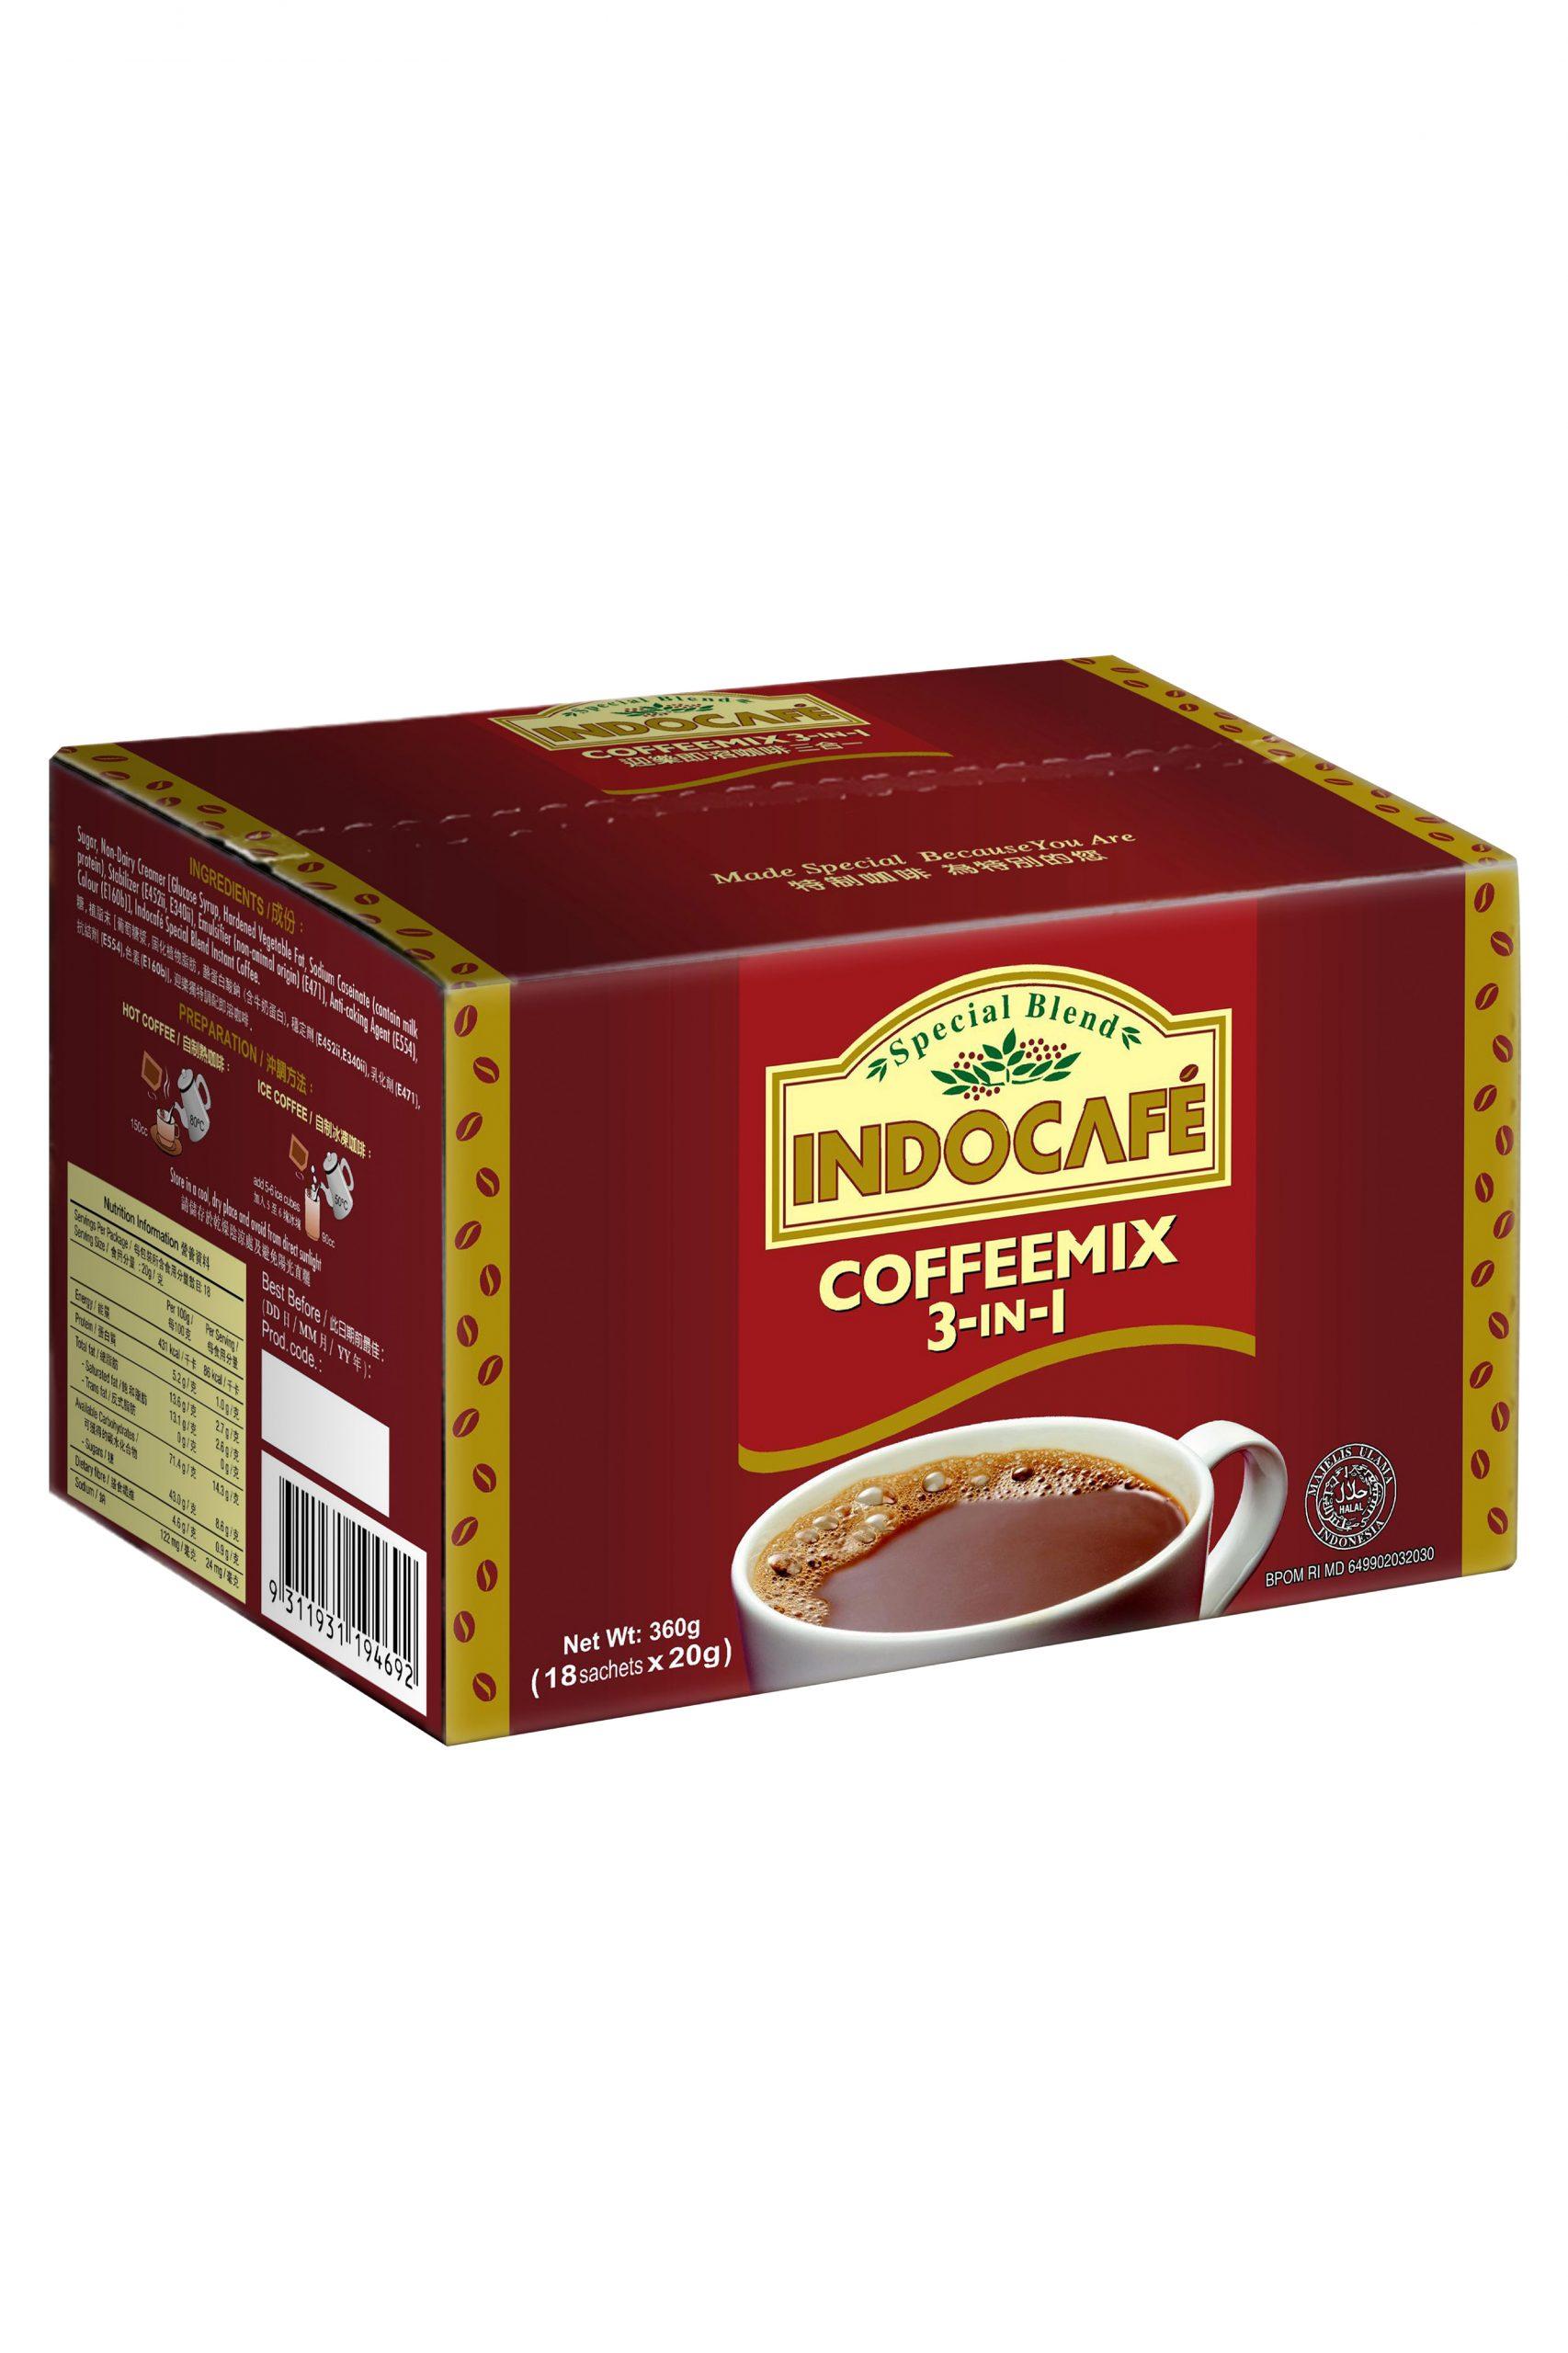 Special Blend Coffeemix